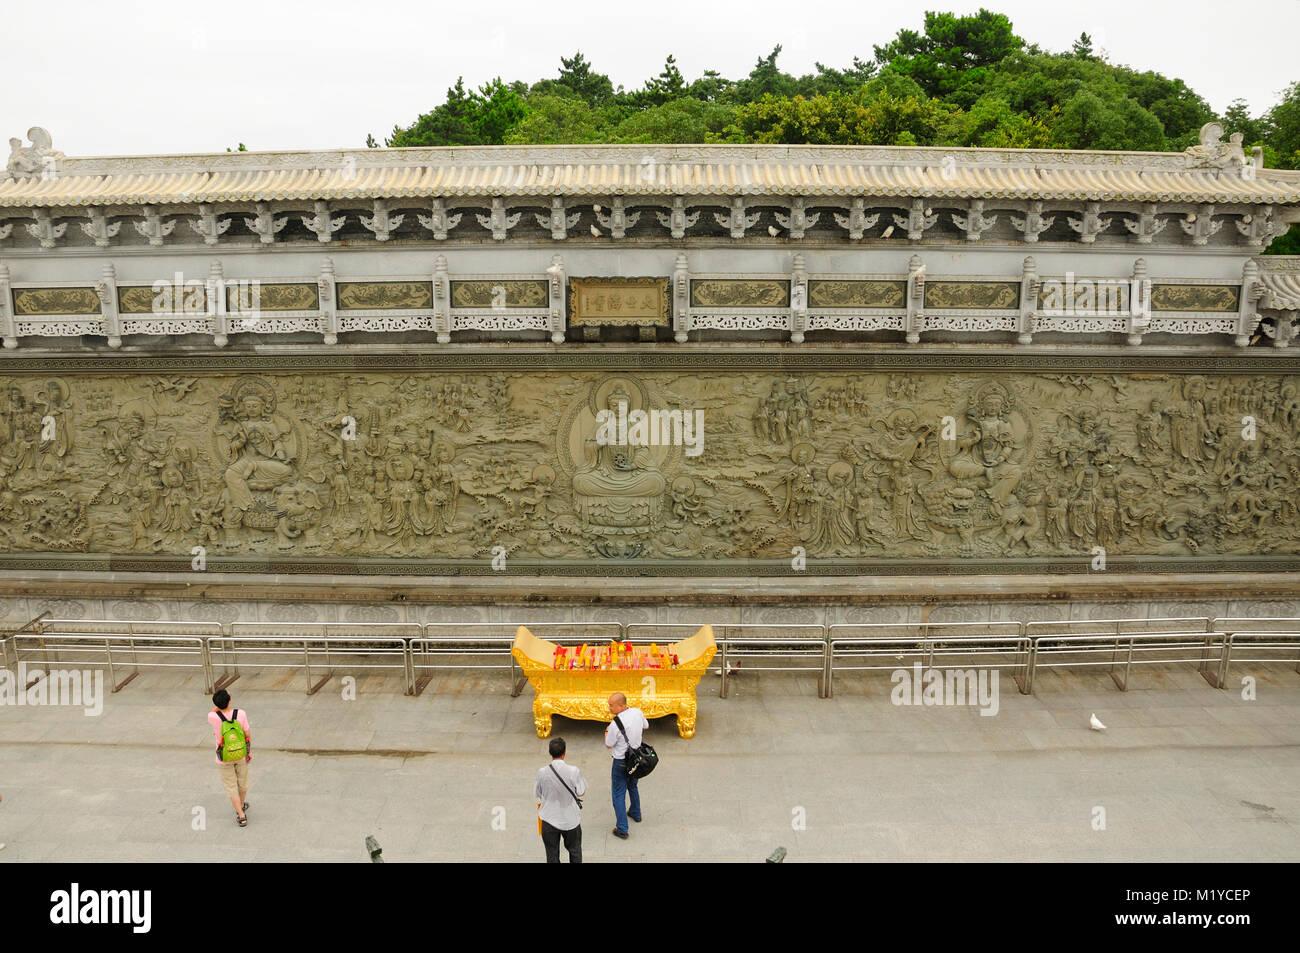 July 19, 2015.  Putuoshan, China.  A large Buddhist religious  mural and Chinese tourists on the island of Putuoshan - Stock Image